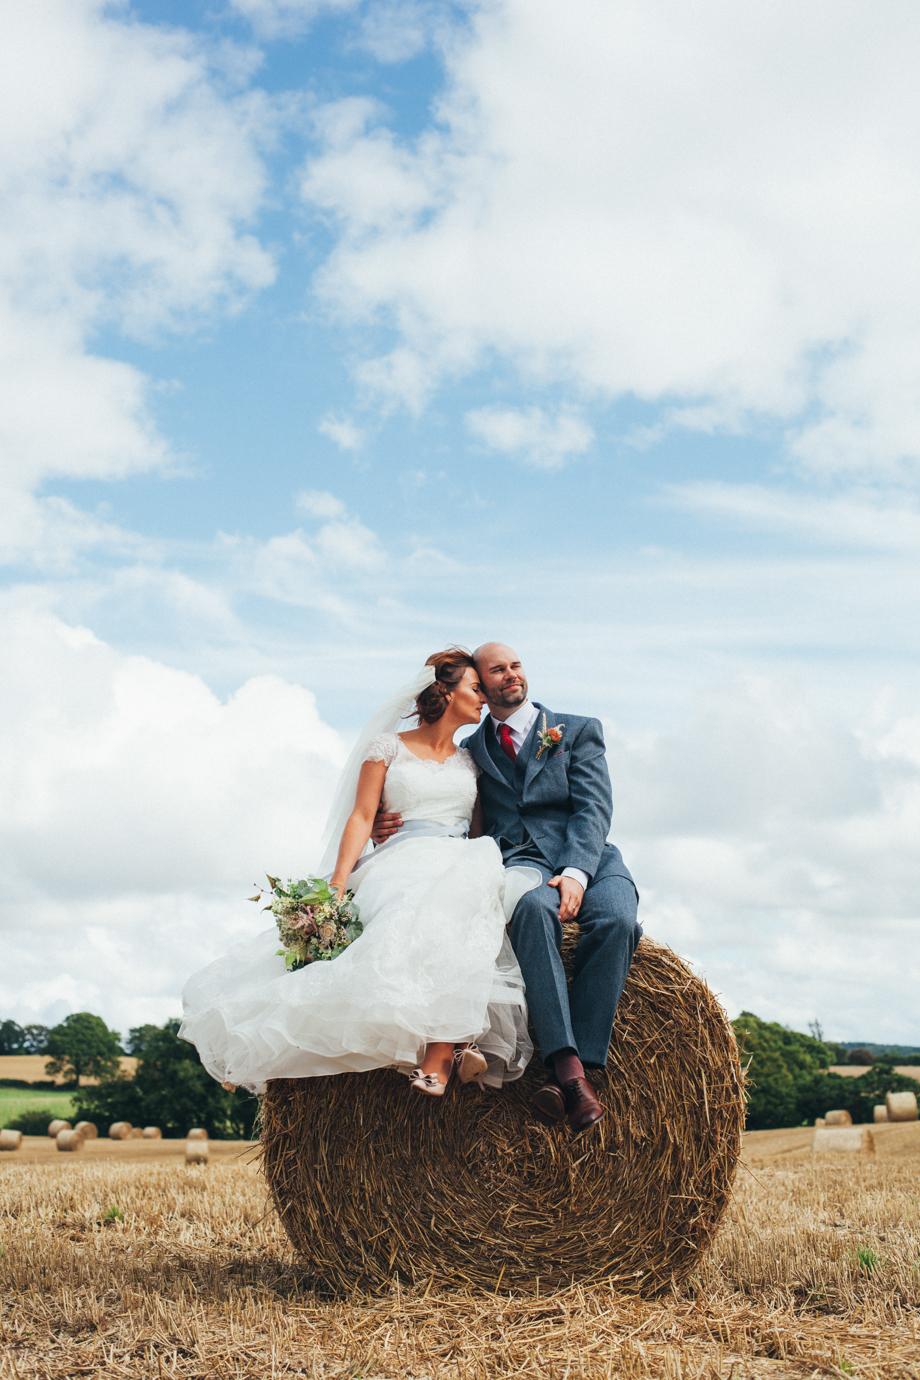 Shropshire-Festival-Wedding-37